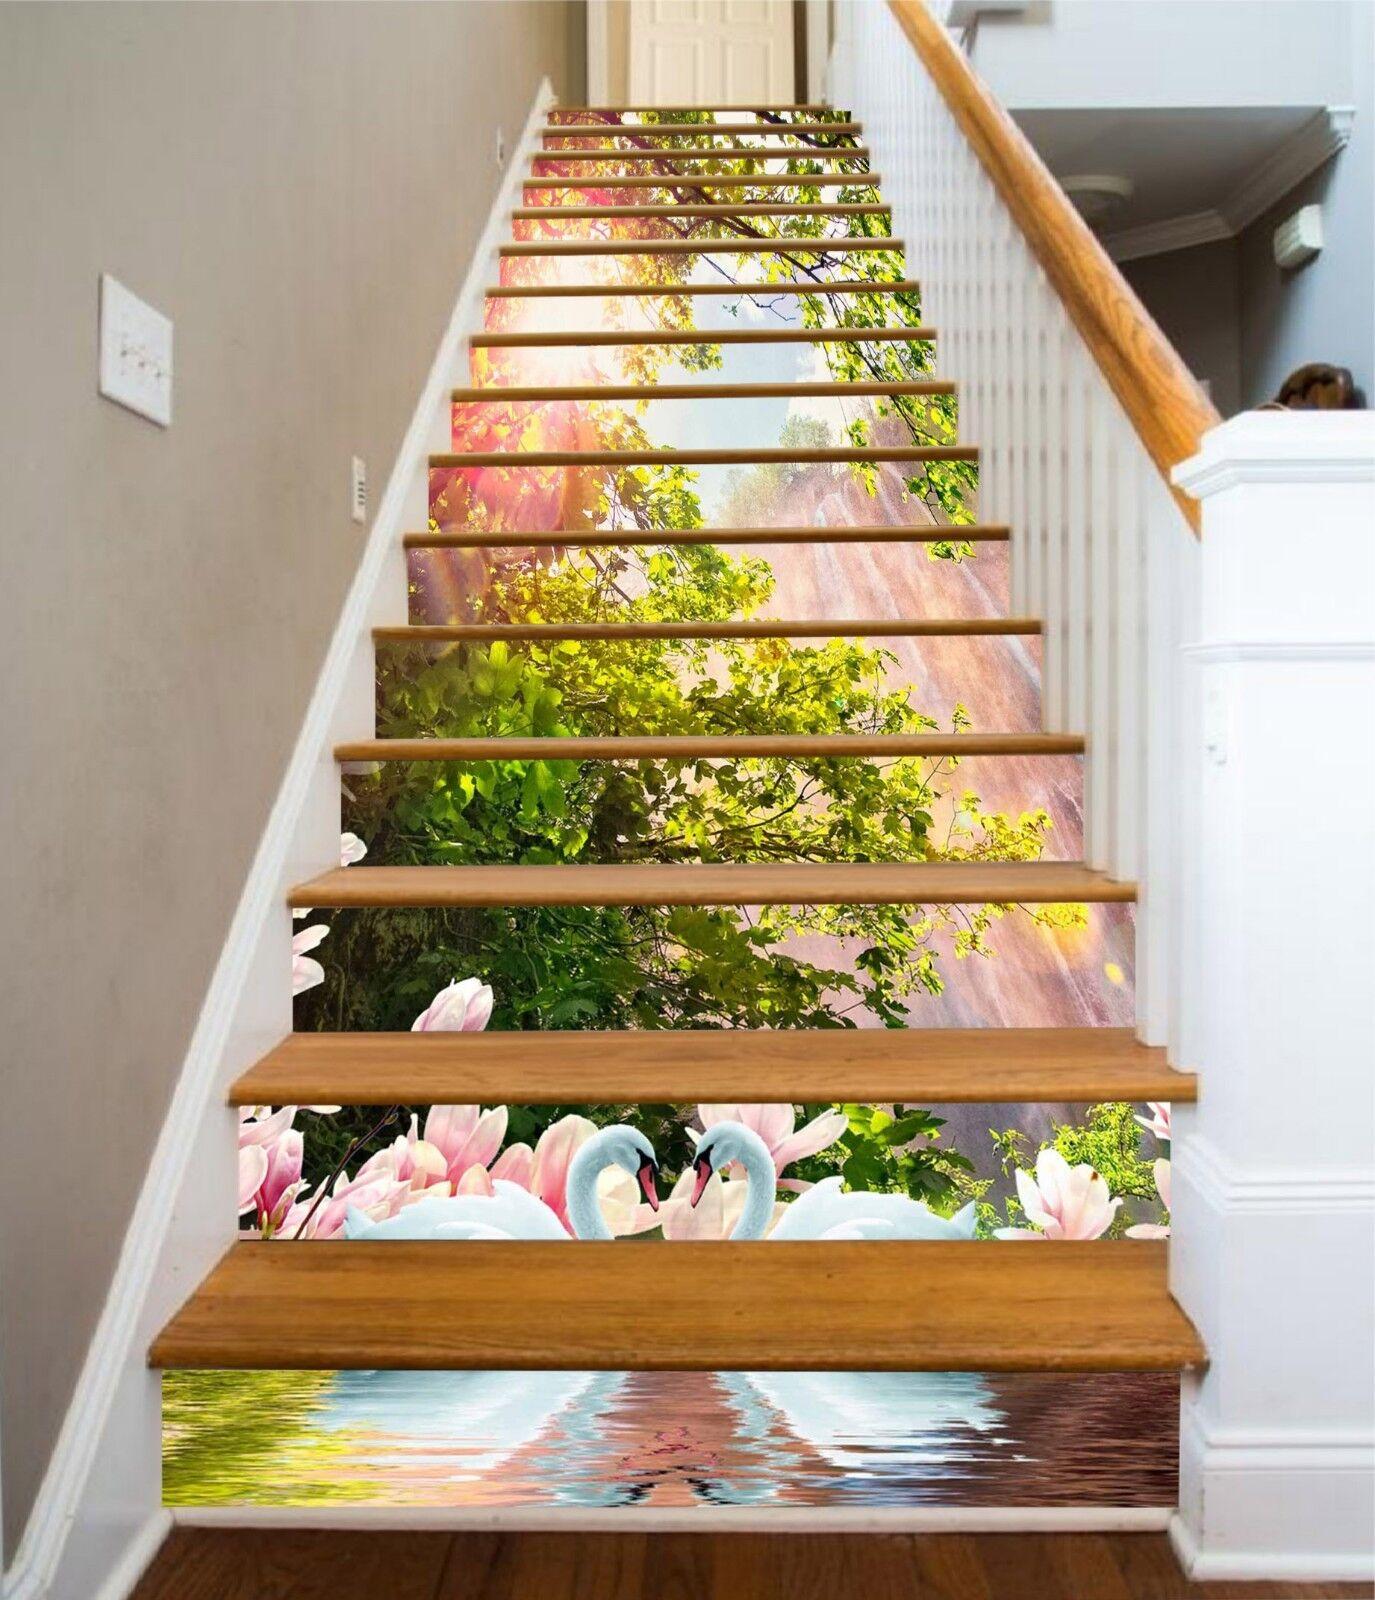 3D Sun Tree Flowers Stair Risers Decoration Photo Mural Vinyl Decal Wallpaper UK